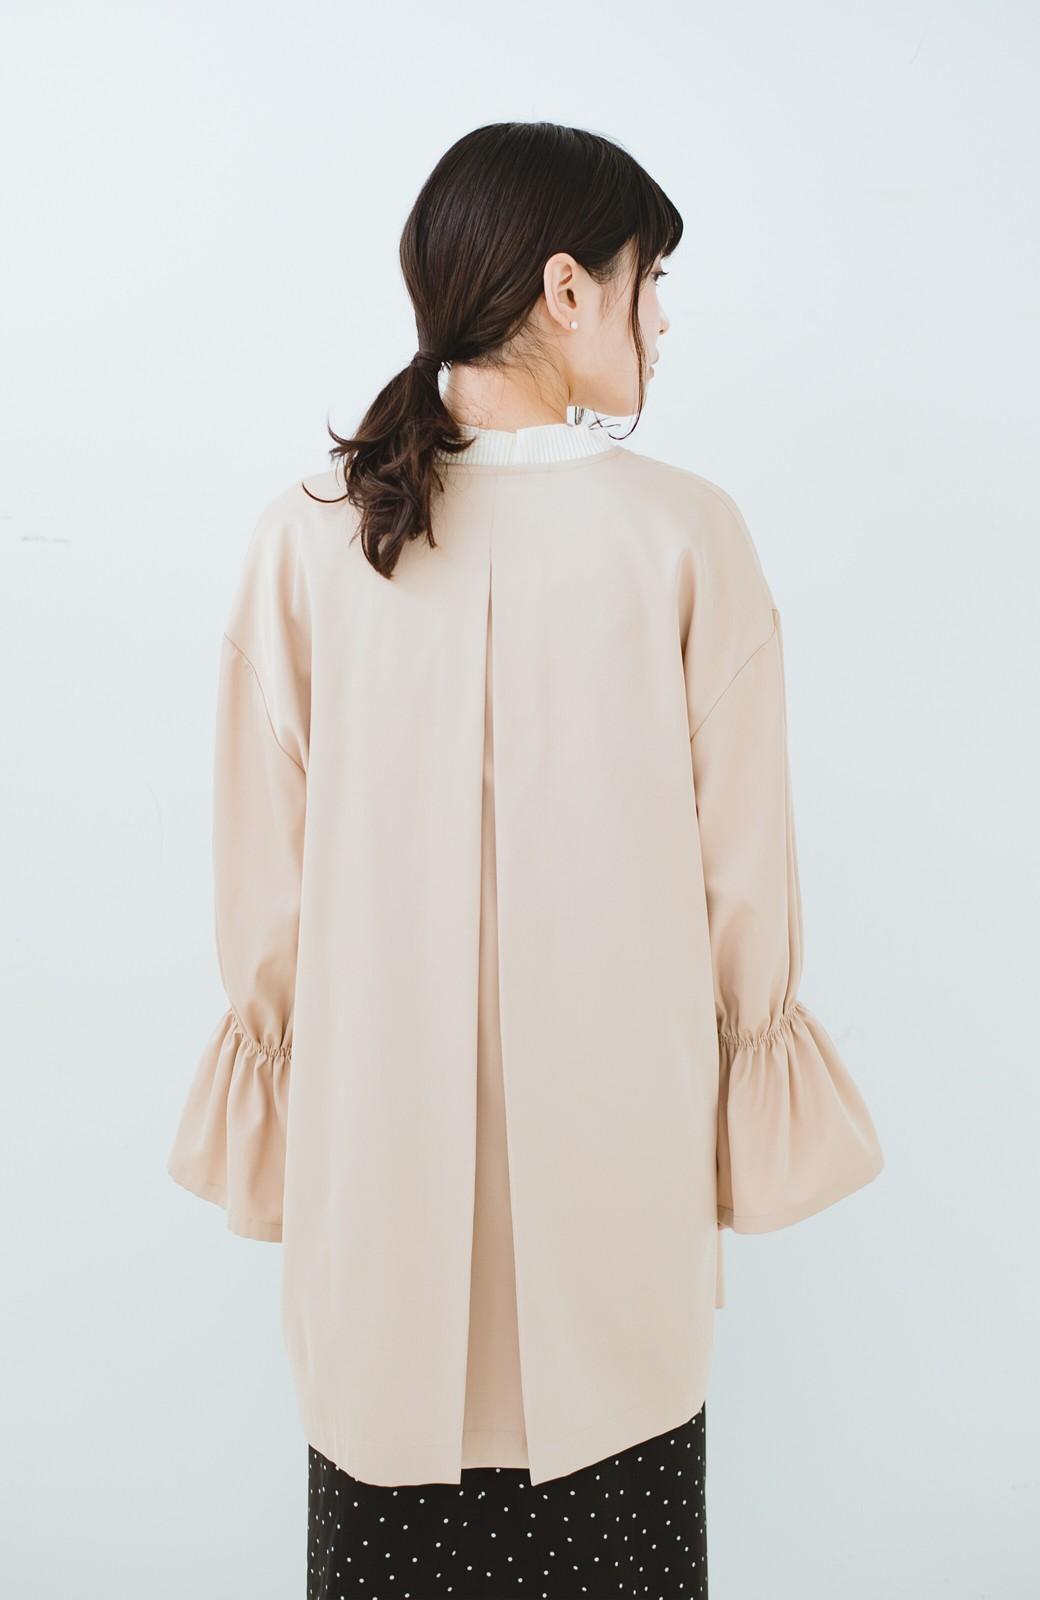 haco! ただ羽織るだけでオシャレに見える 気軽なフレアースリーブコート <ベージュ>の商品写真14